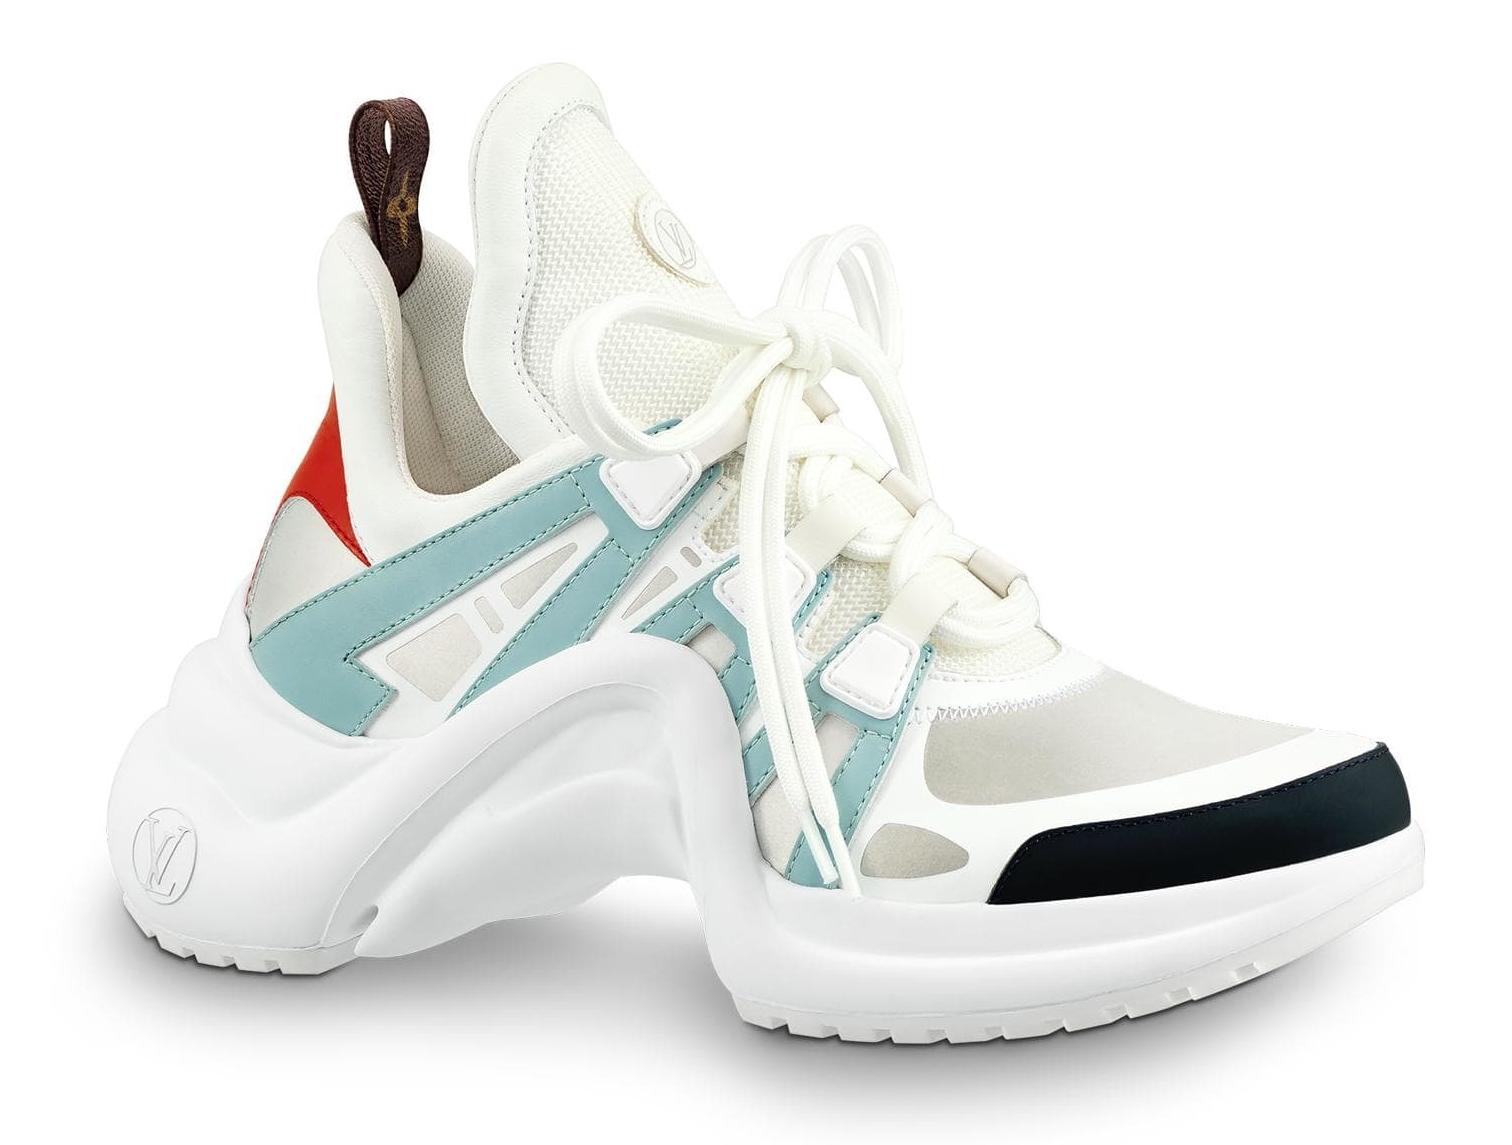 LV Archlight Sneaker,  Louis Vuitton , $1090